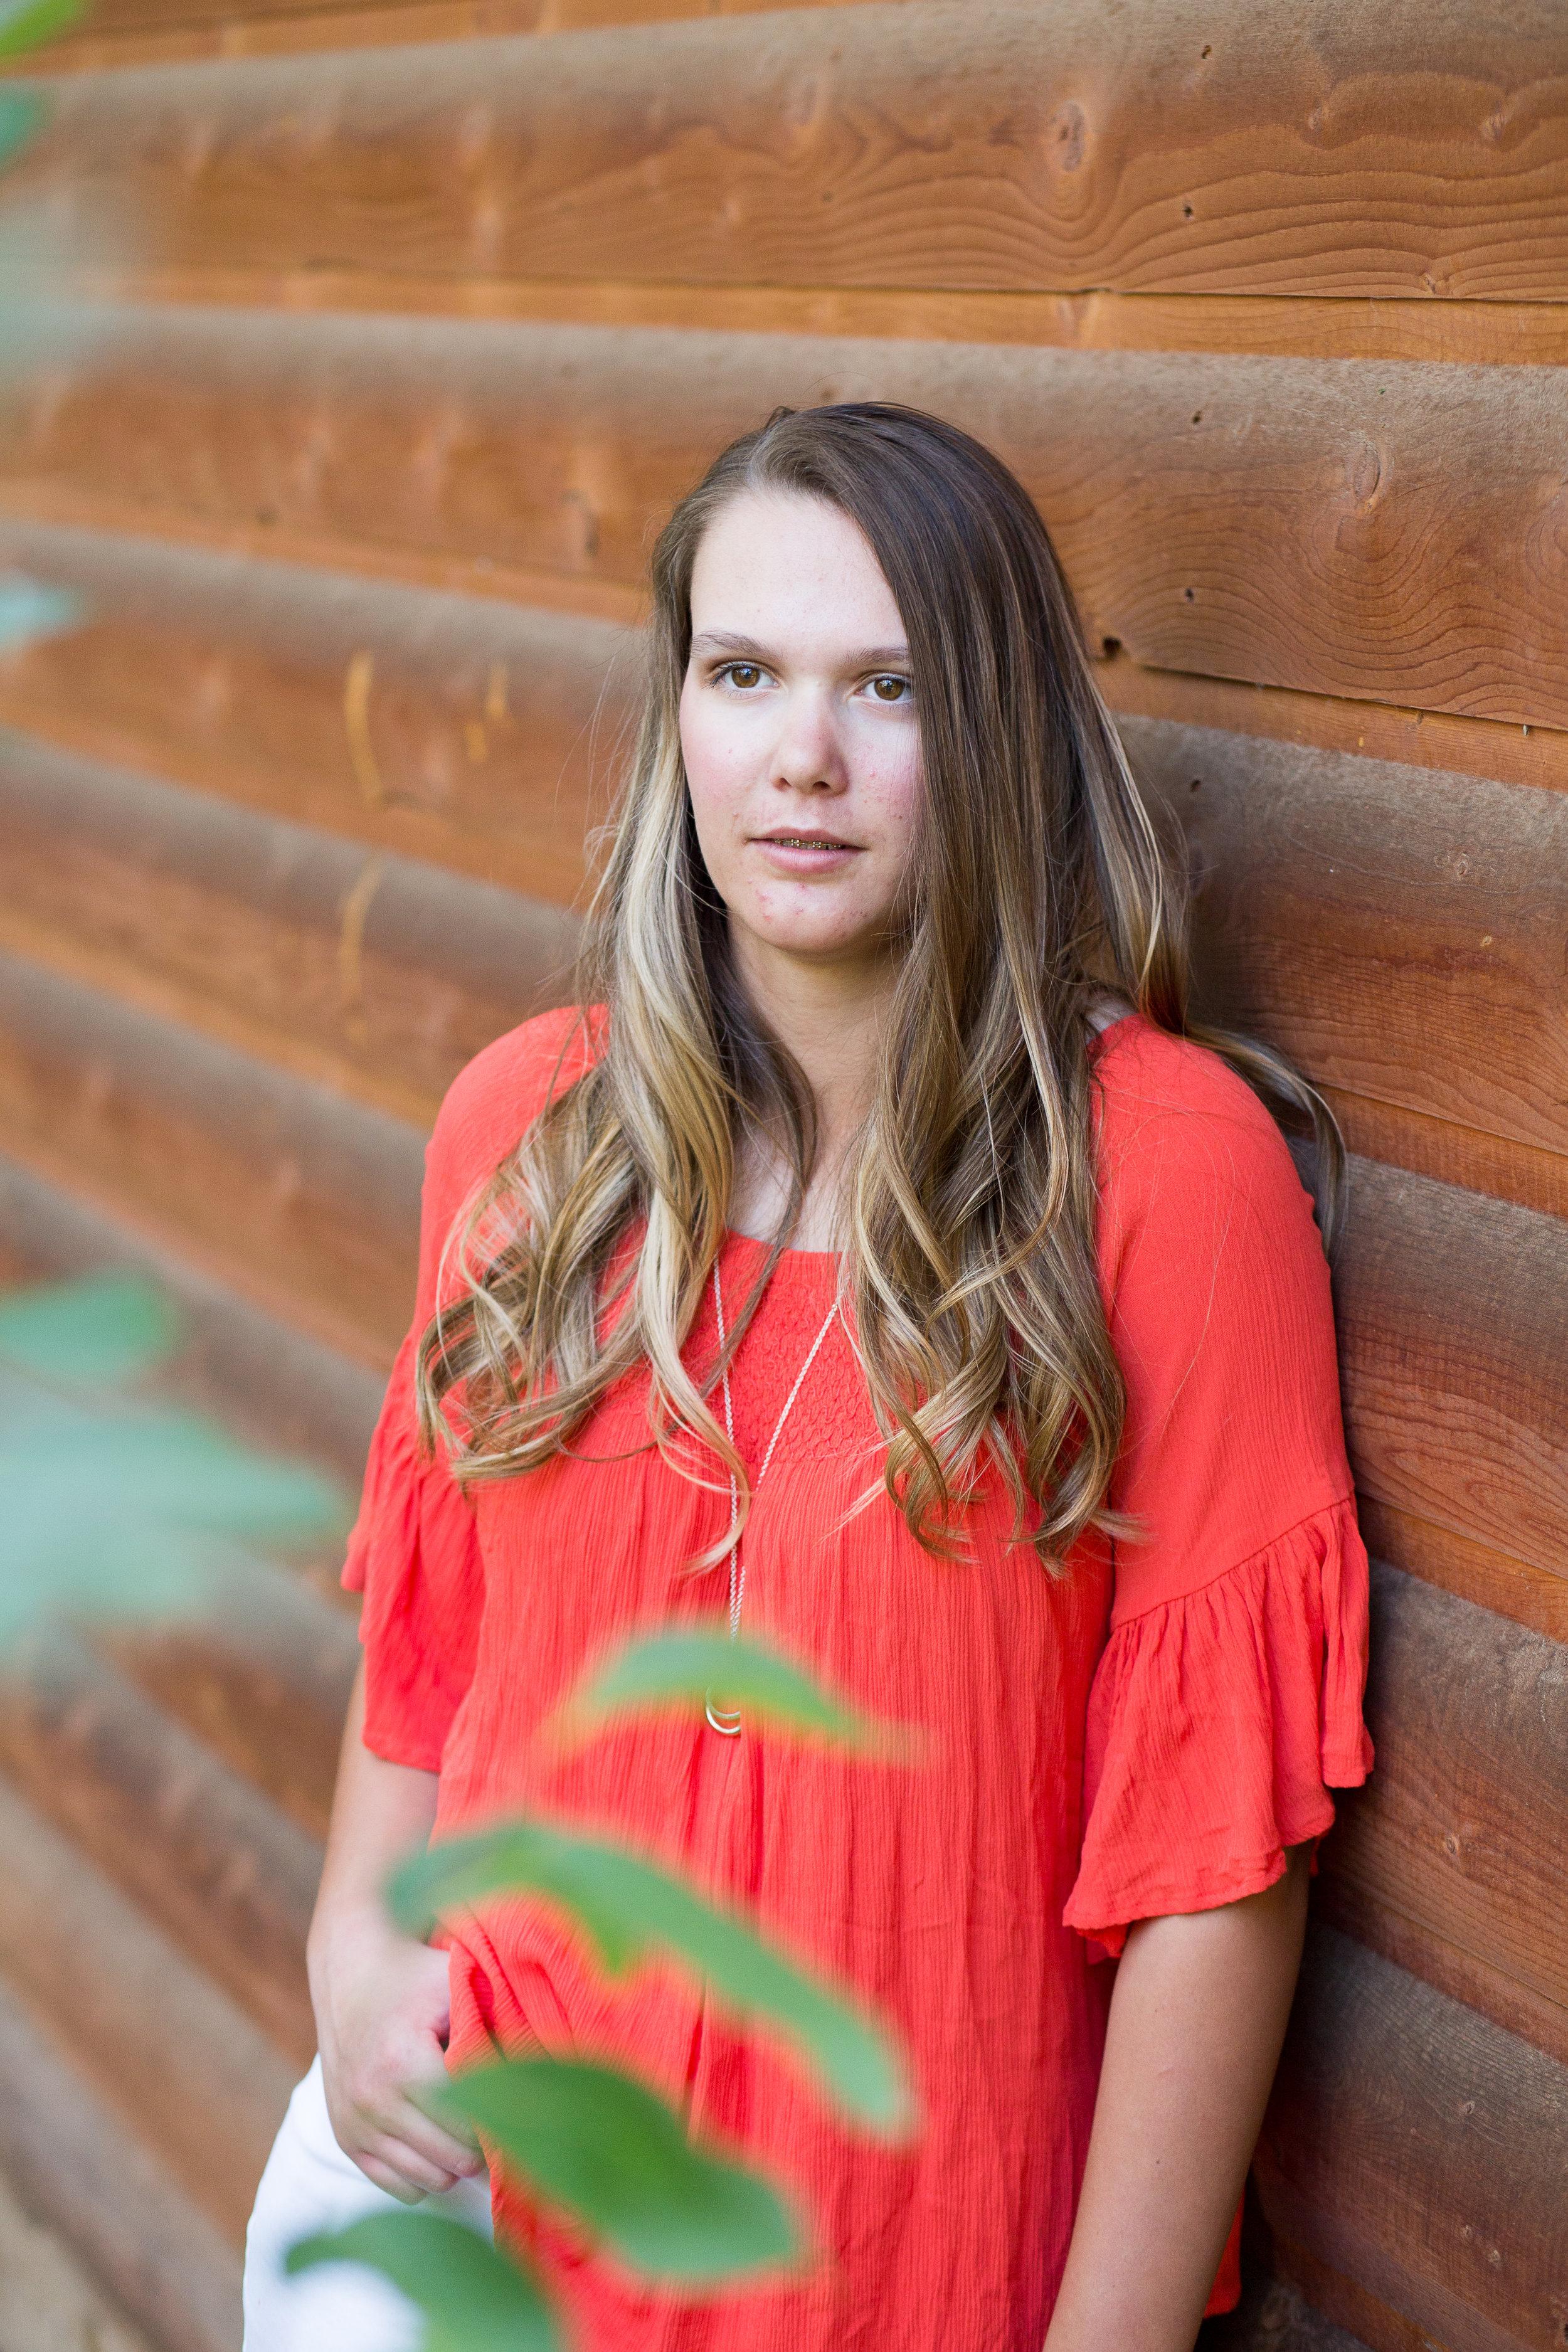 Colorado Springs Senior Photographer   Colorado Springs Senior Photography   Stacy Carosa Photography   Senior girl sitting among forest for portrait session